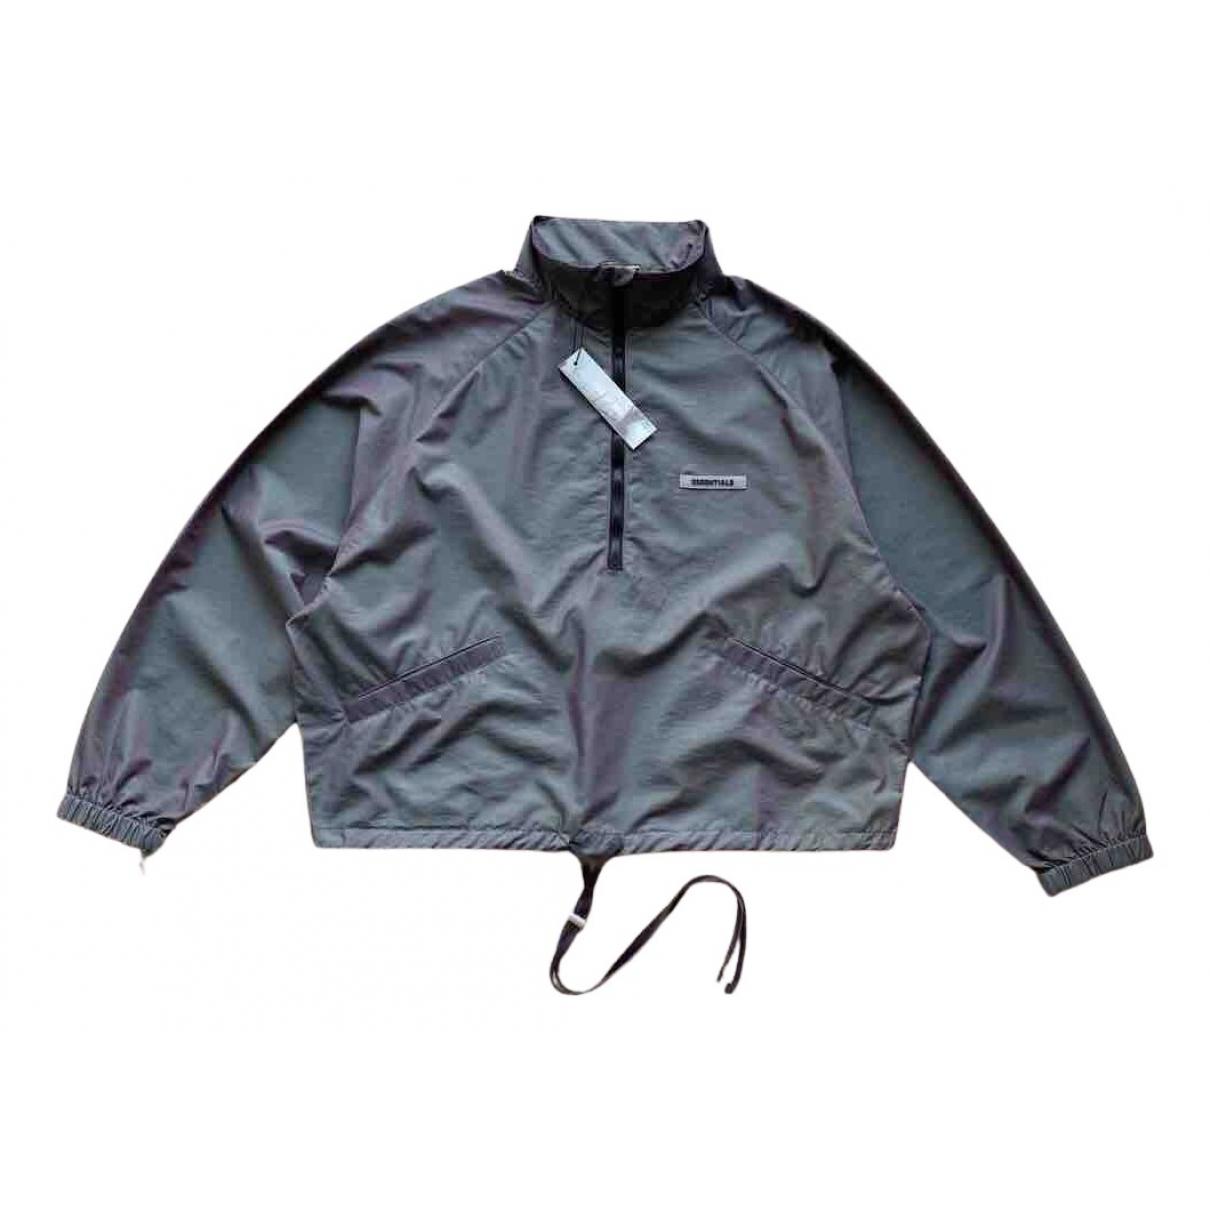 Fear Of God N Blue Leather jacket for Women XS International